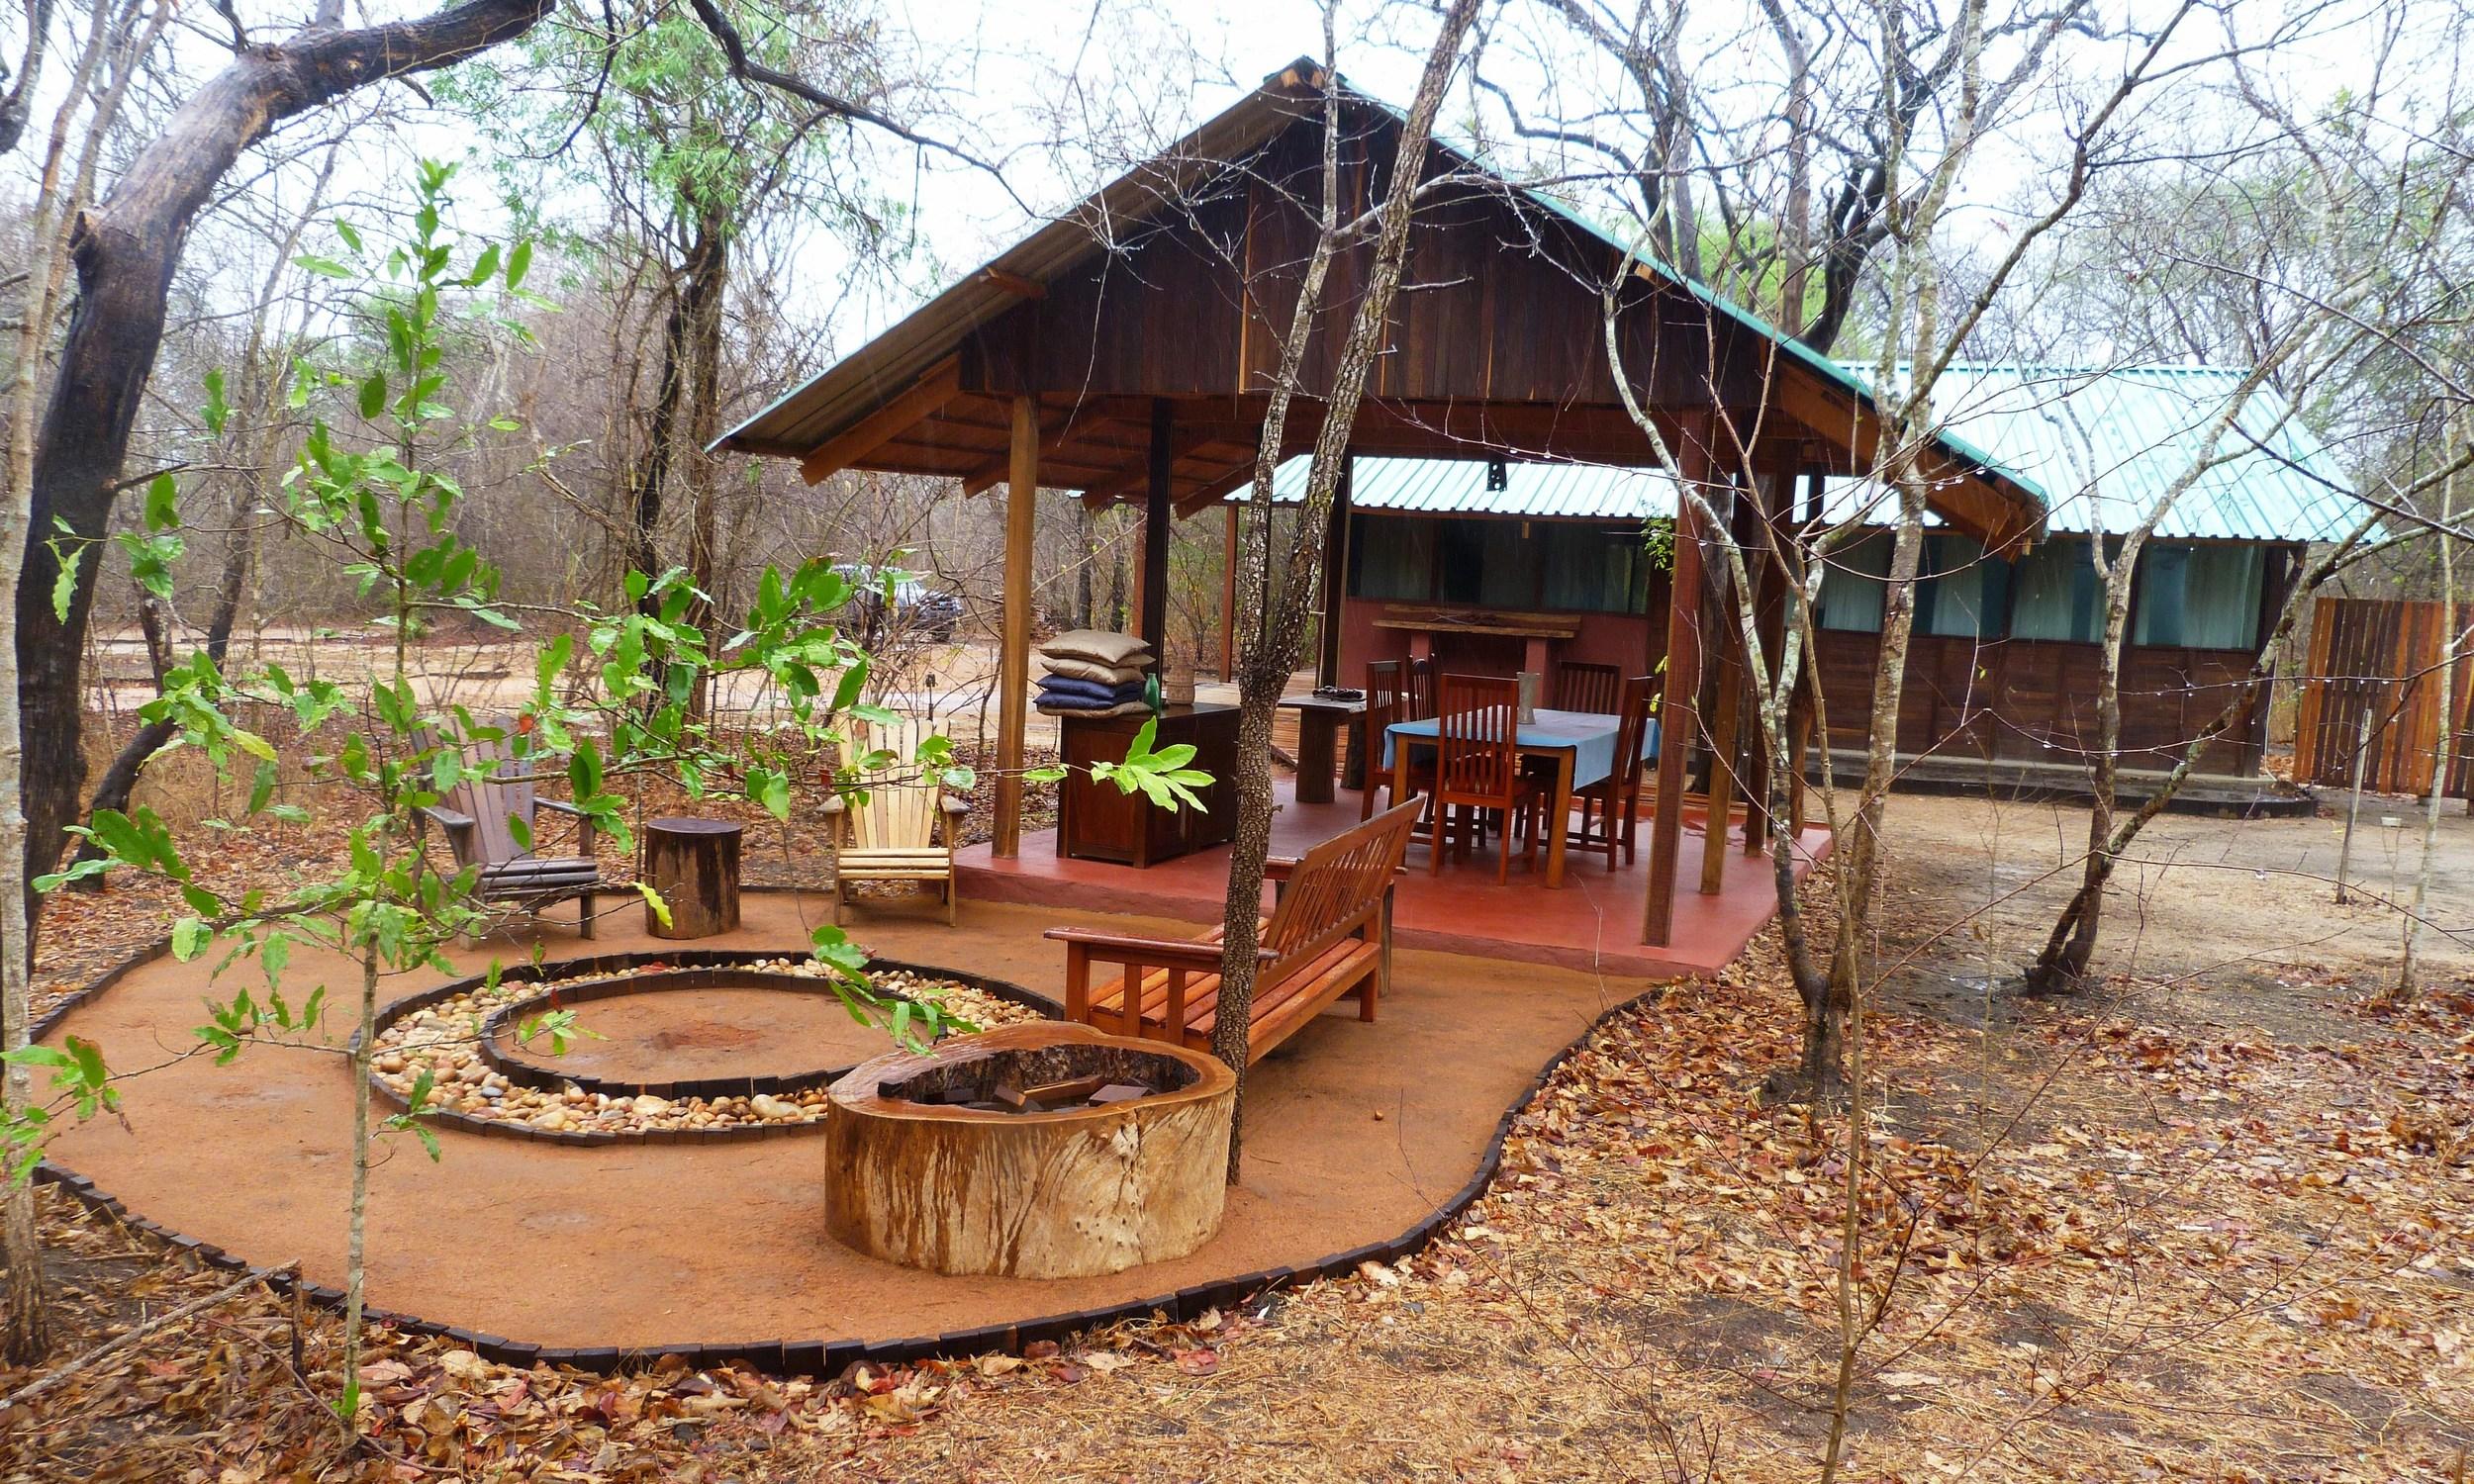 Cabana 25 em Mphingwe, 28 pessoas poder ficar hospedadas na unidade de turismo  -Cabin 25 at Mphingwe, a total of 28 people can be accommodated at the tourism facility